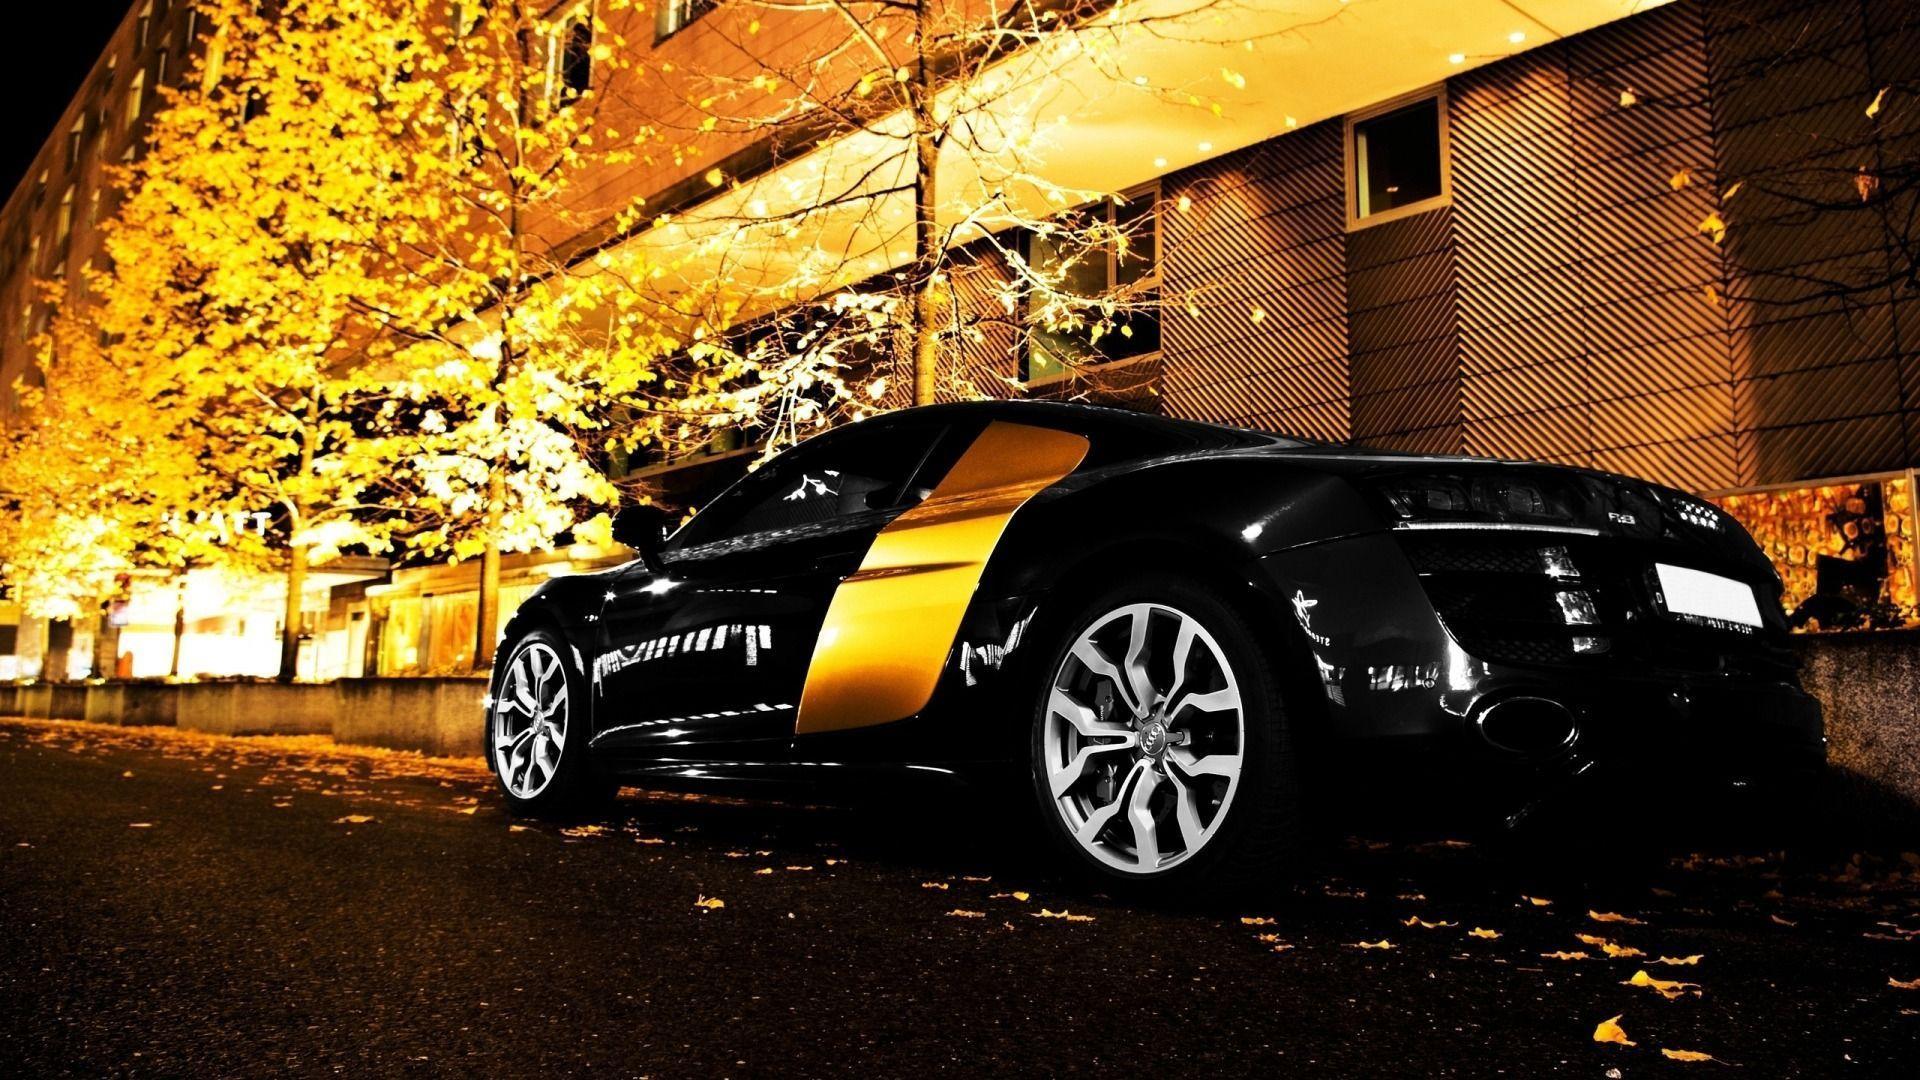 Wallpaper Hd 1080p Cars Sf Wallpaper